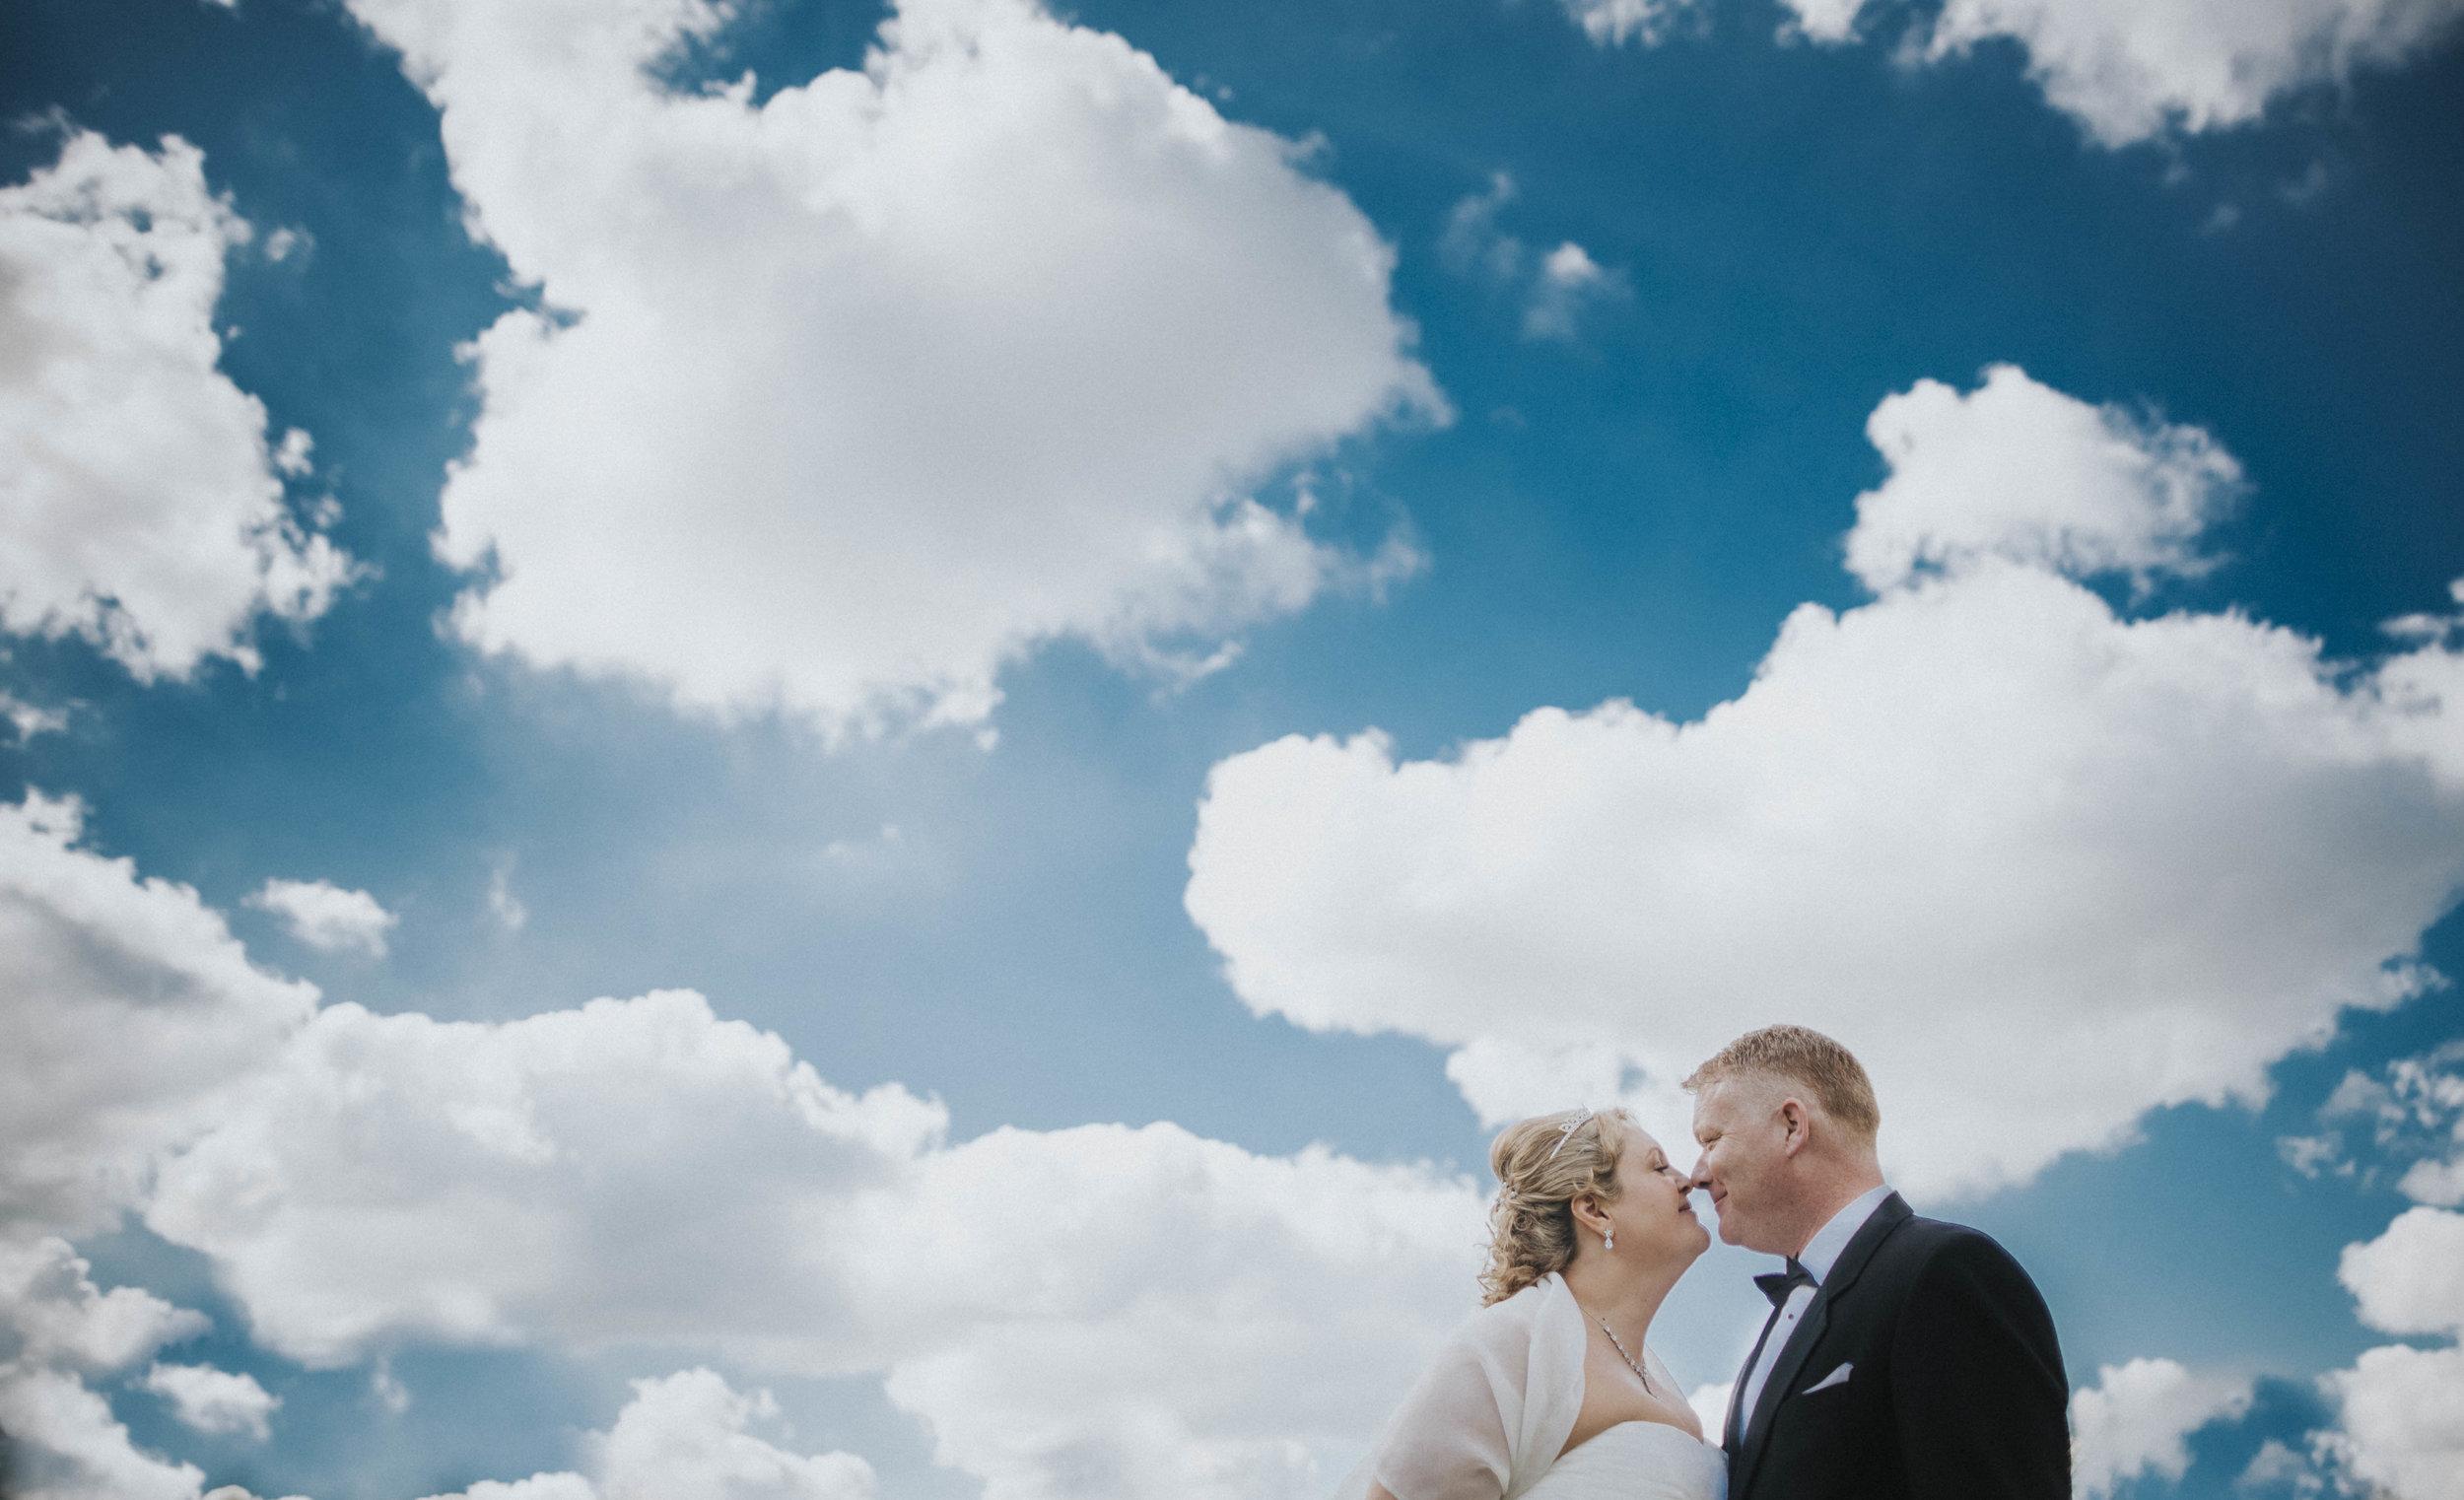 Essex Wedding Photographer + Creative London Wedding Photographer